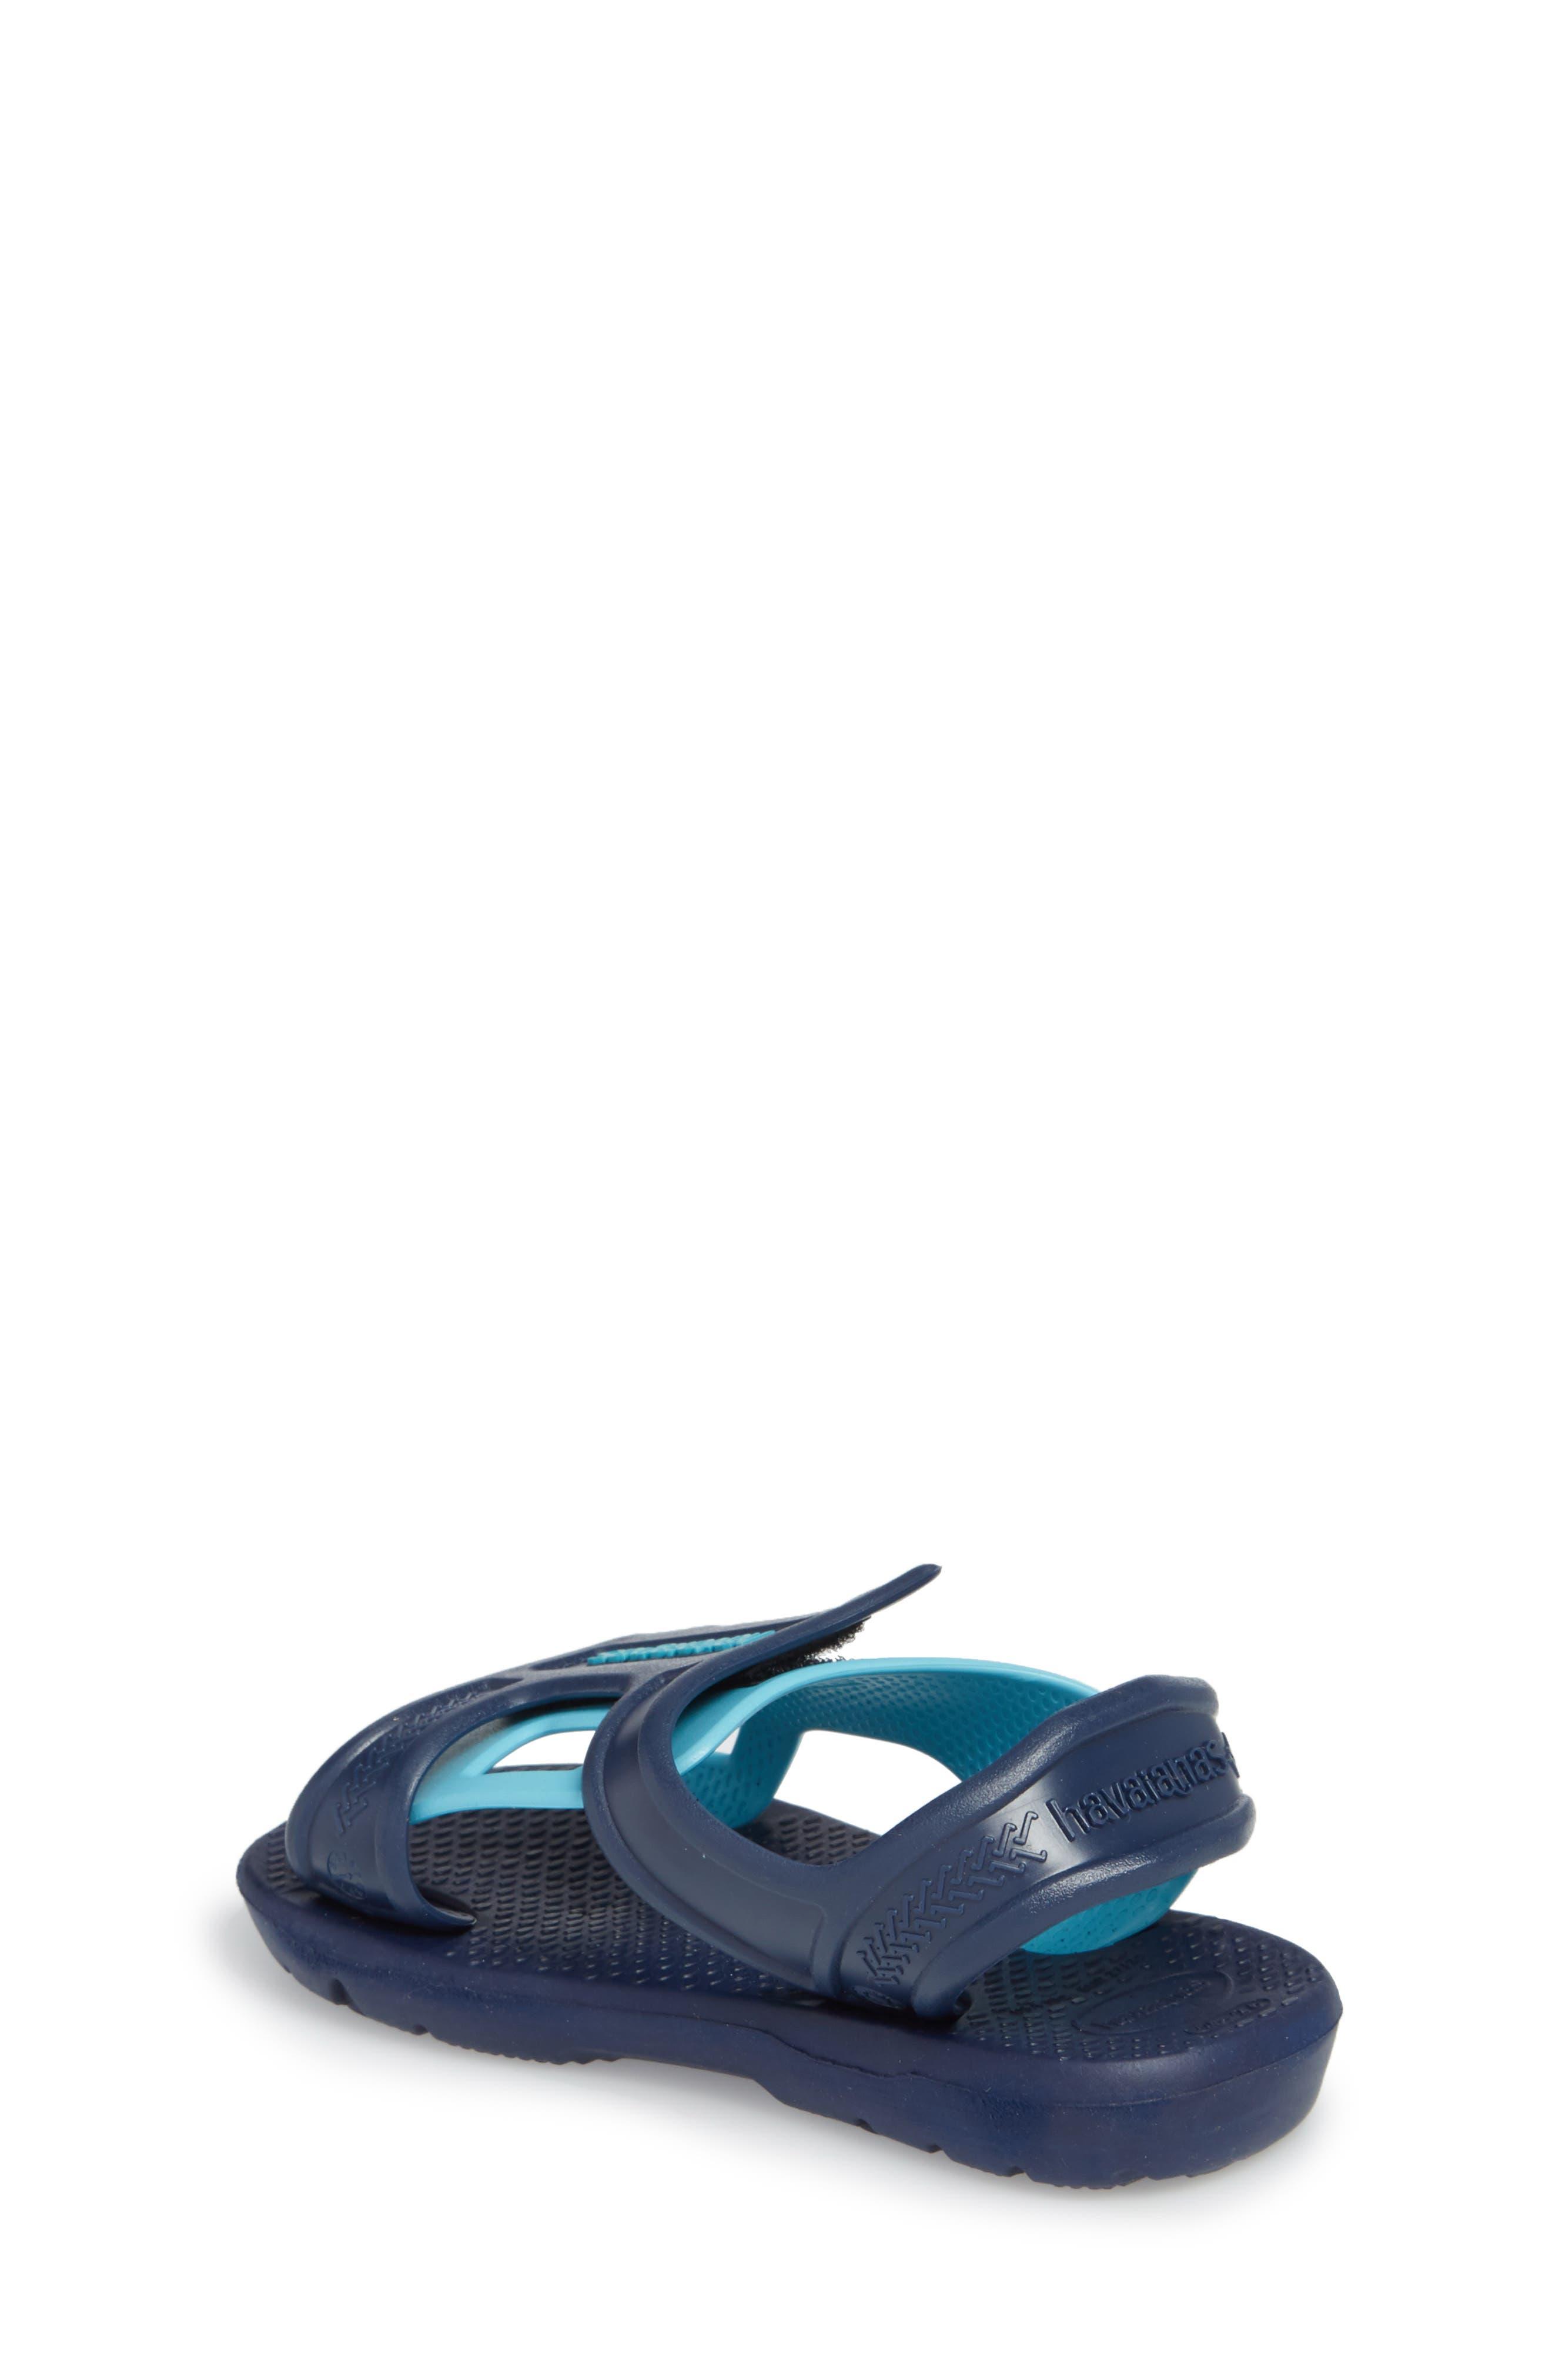 Move Sandal,                             Alternate thumbnail 2, color,                             Navy Blue